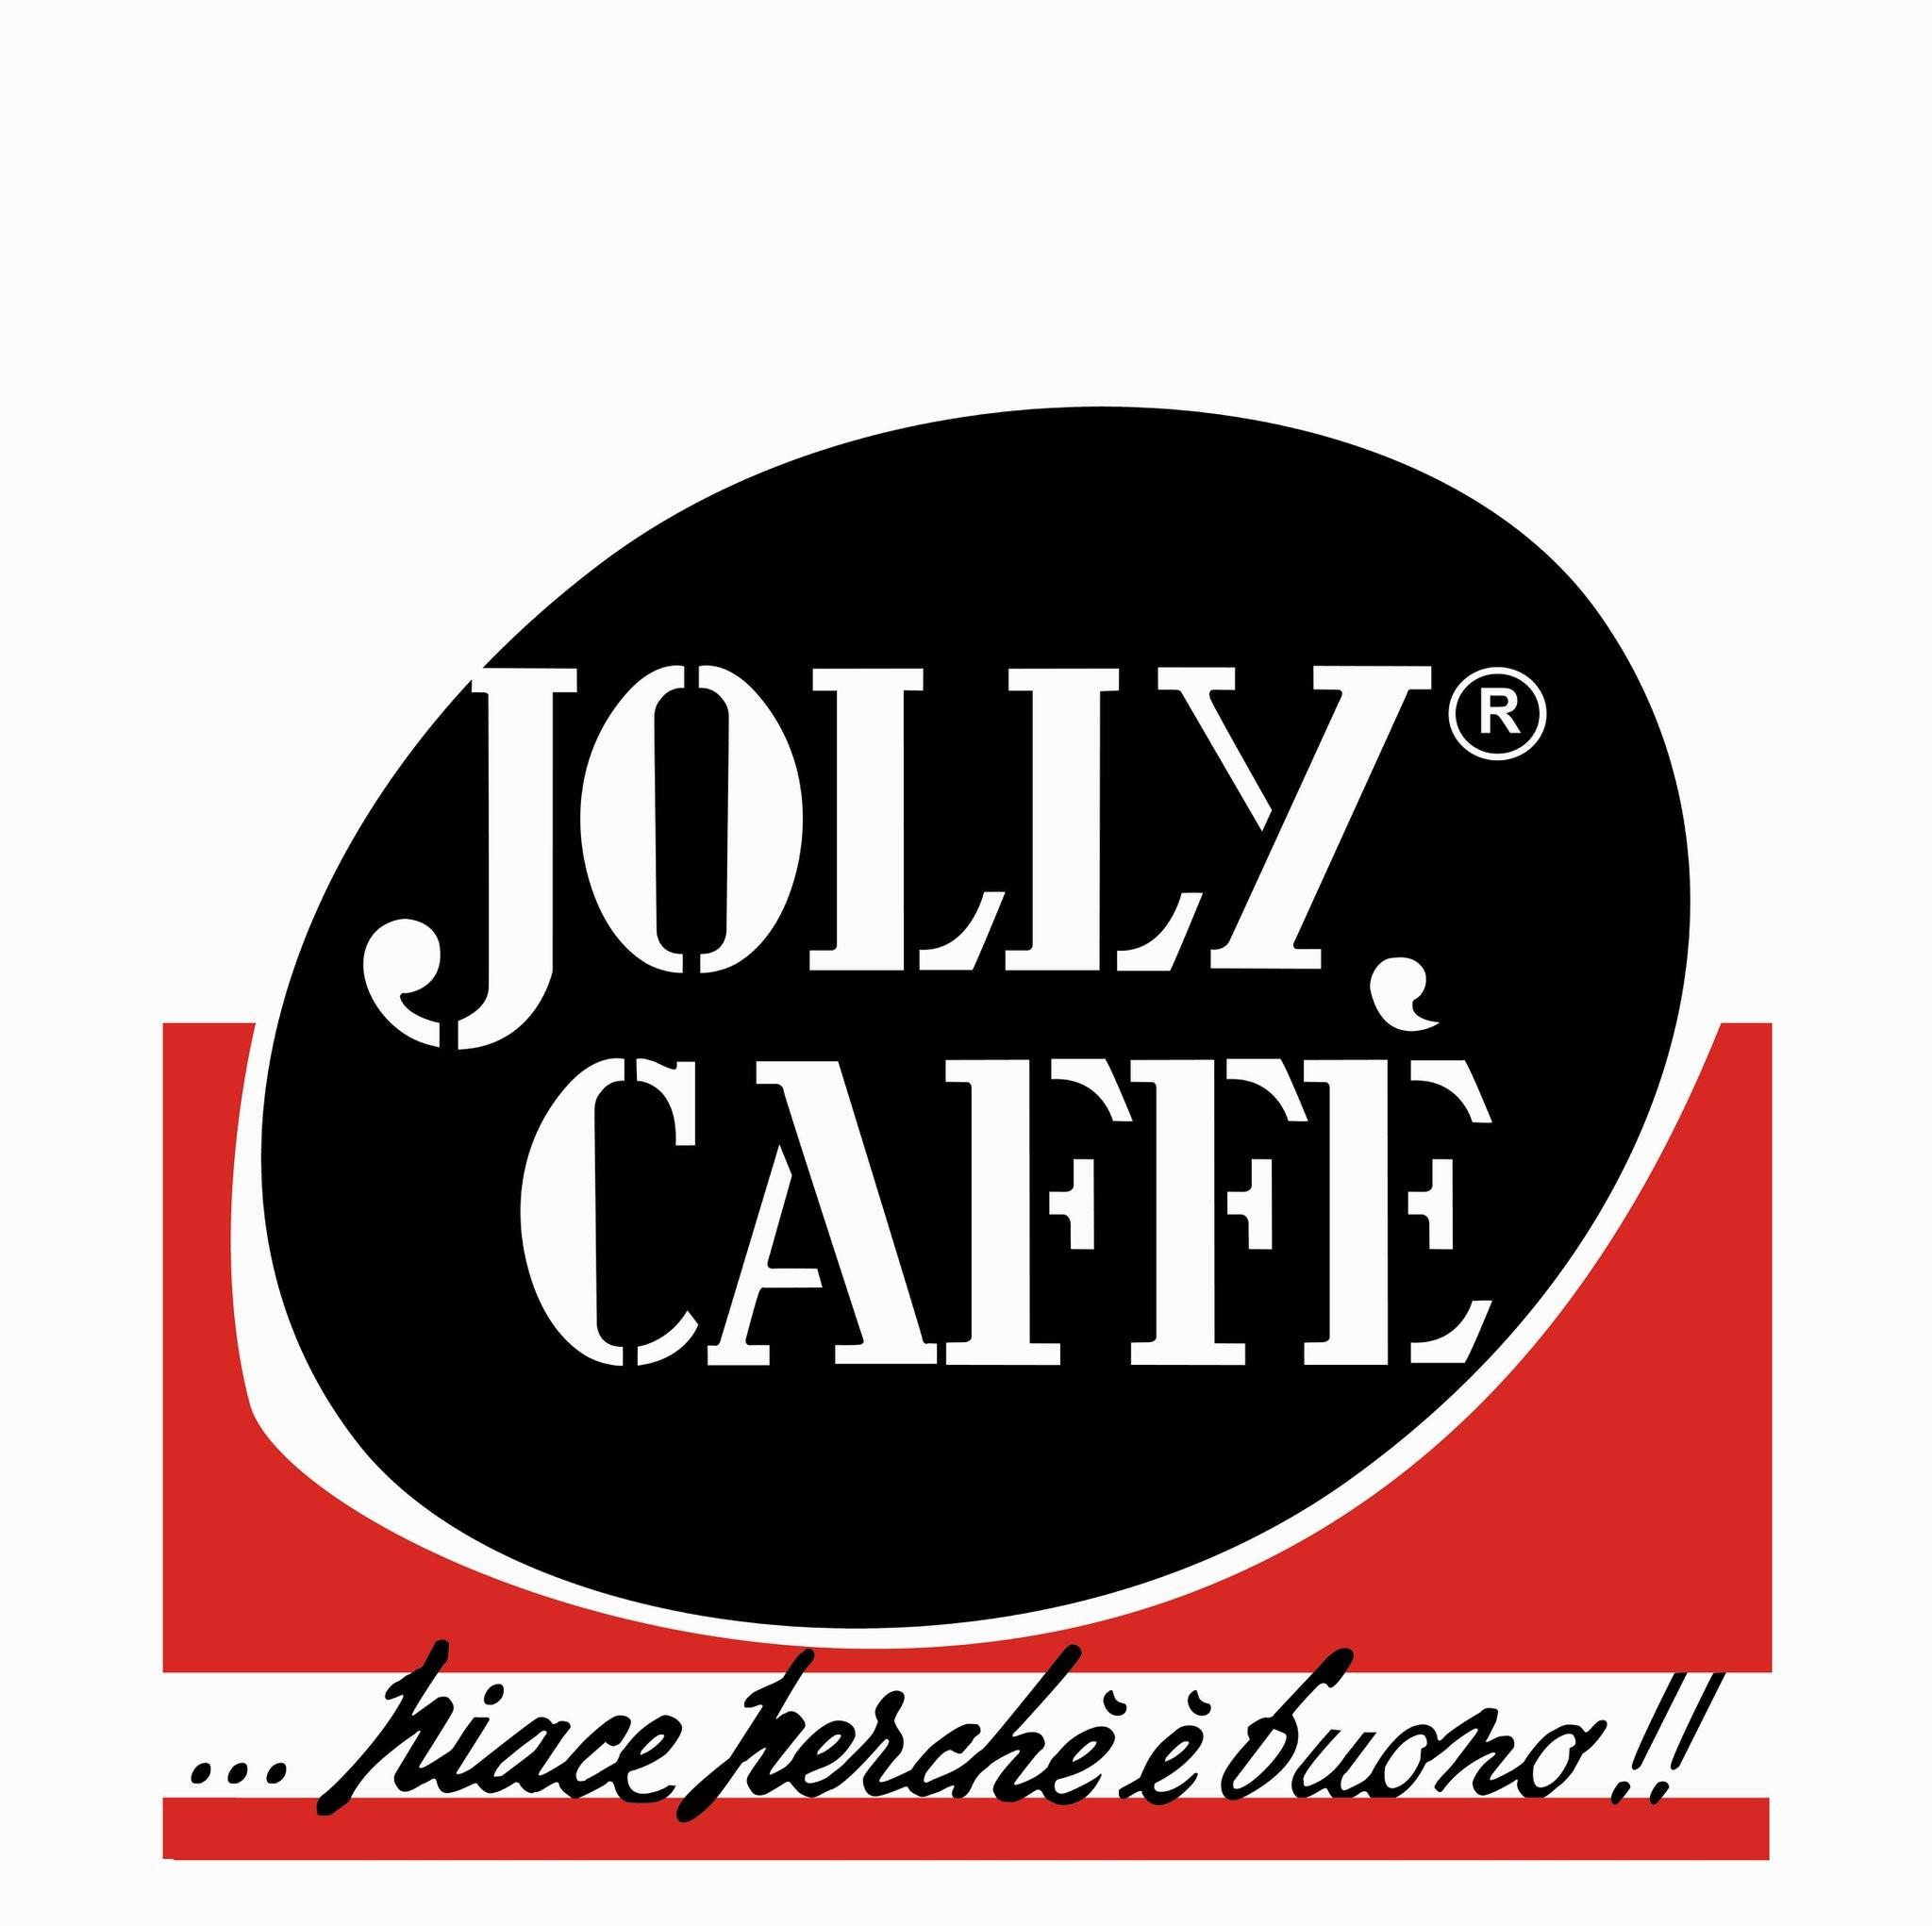 Jolly Caffe